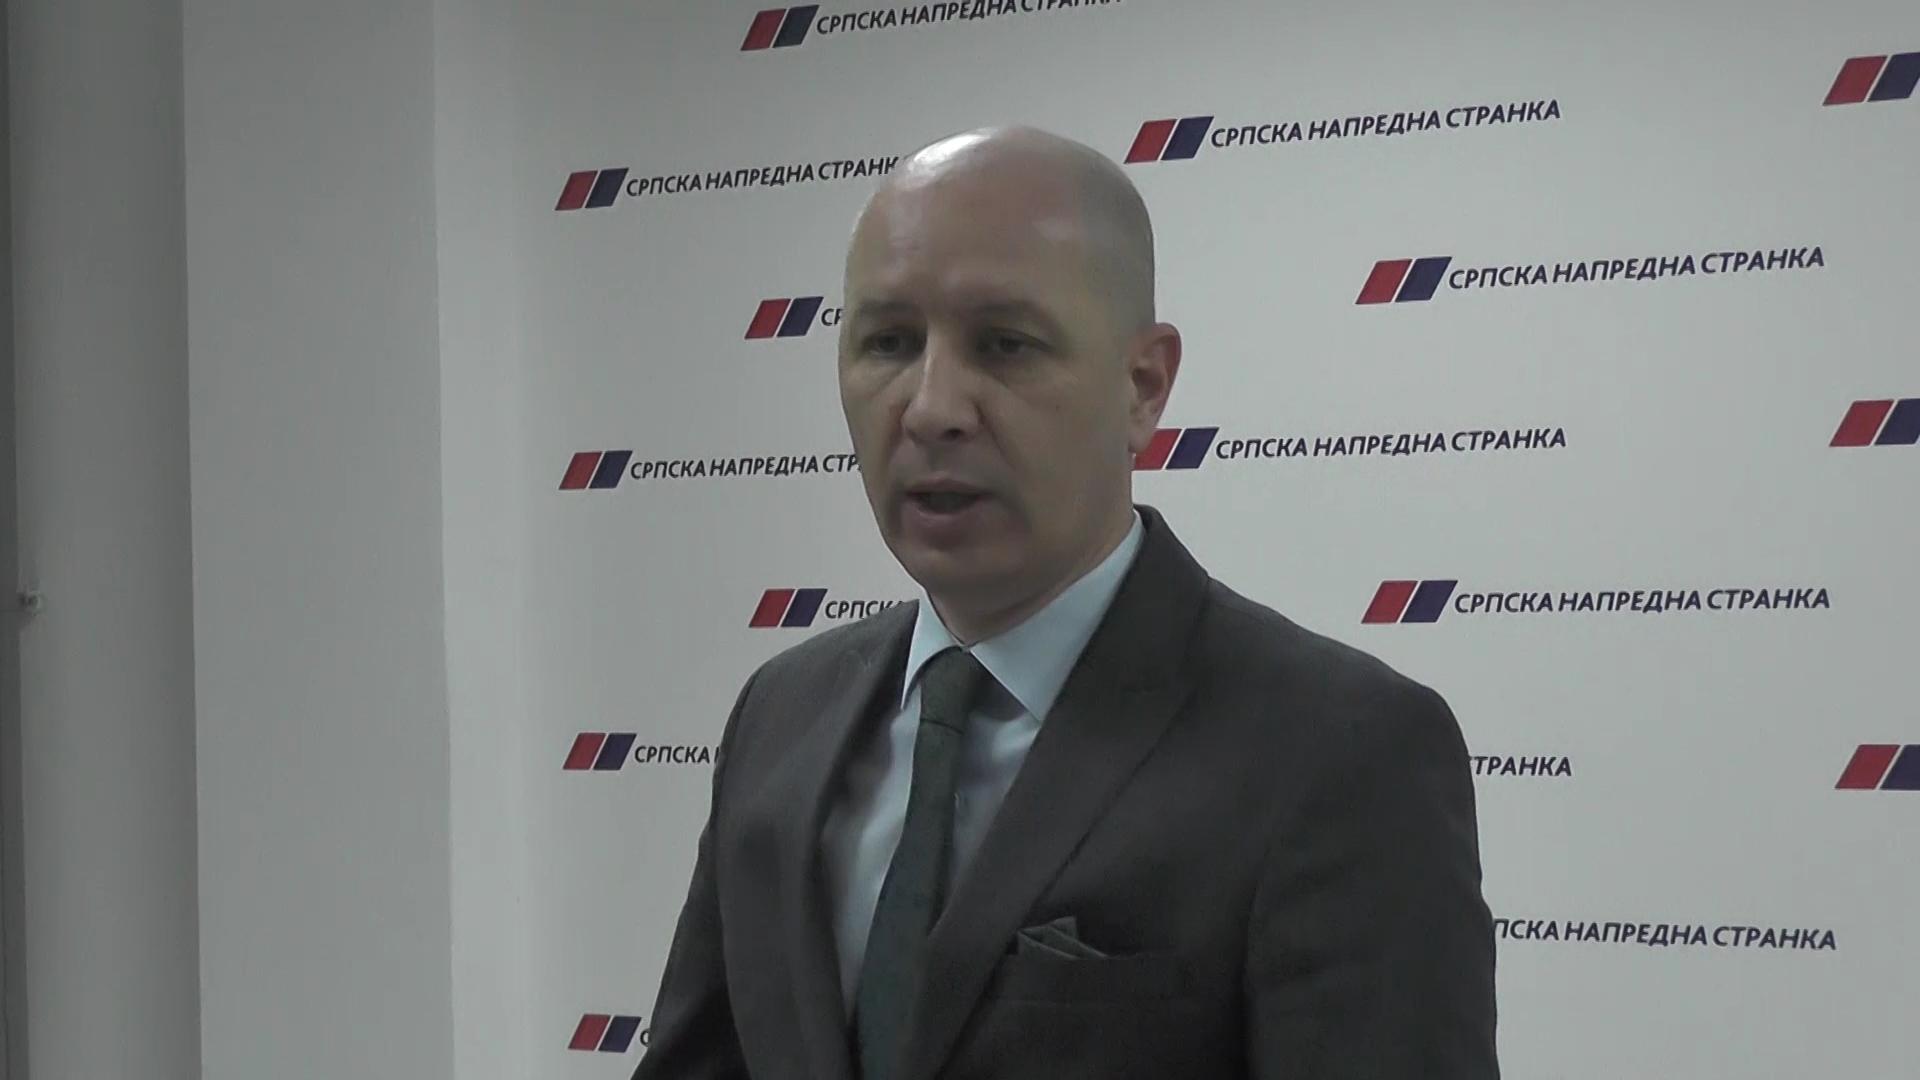 Vanredna sednica Gradskog odbora Srpske napredne stranke